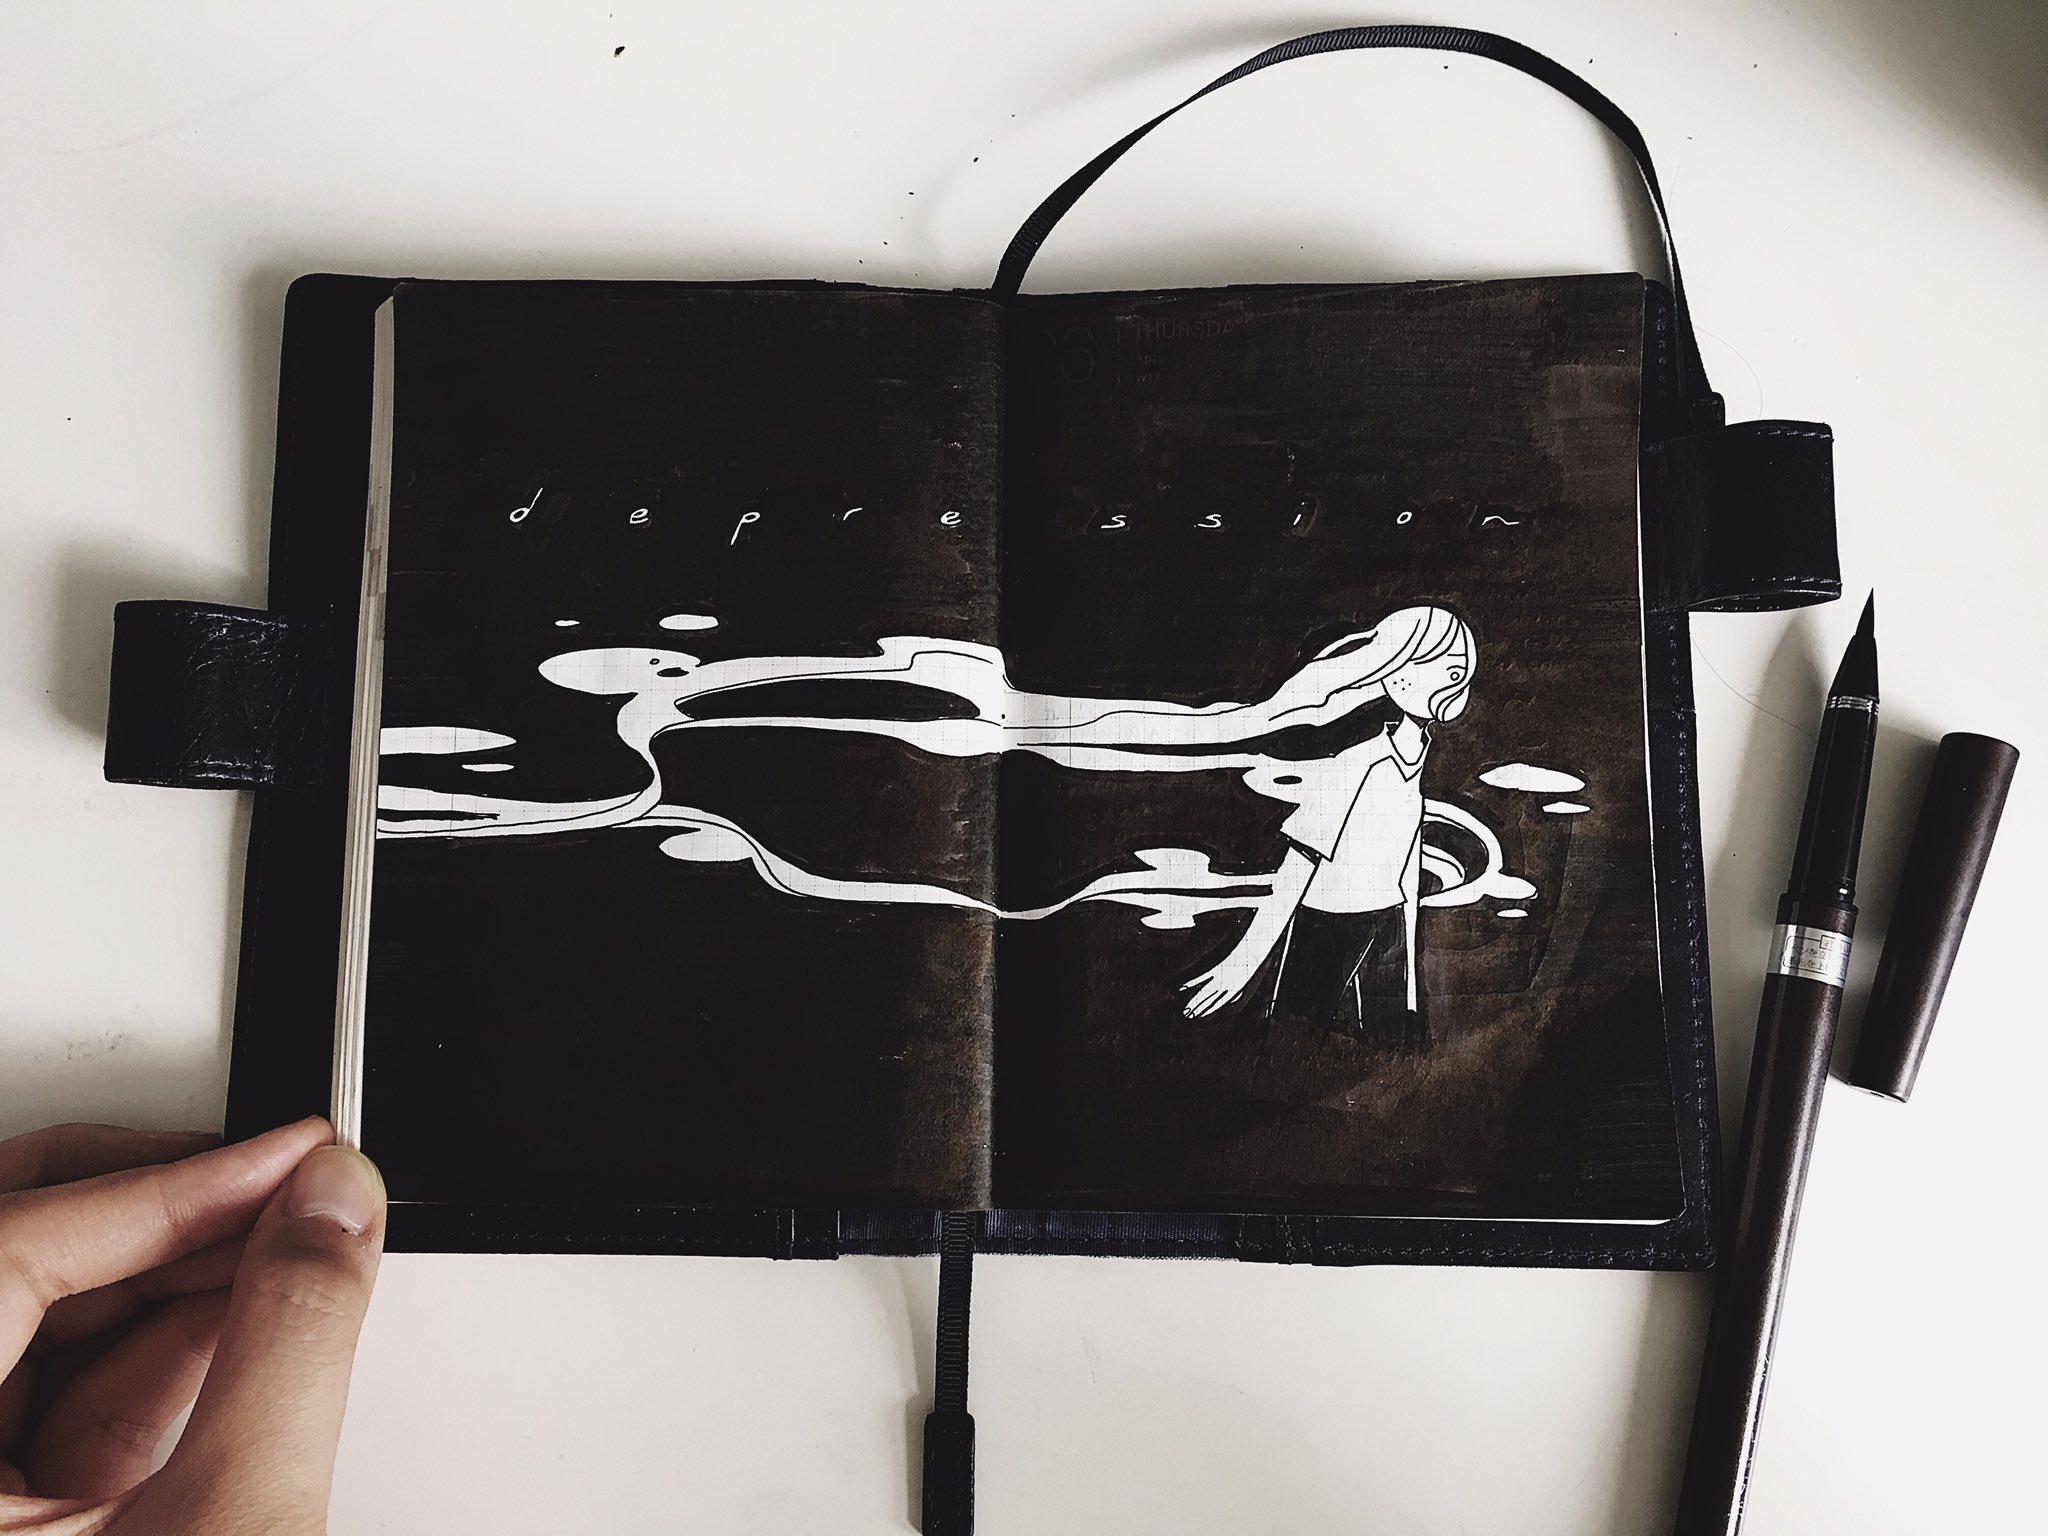 Marker, notebook paper